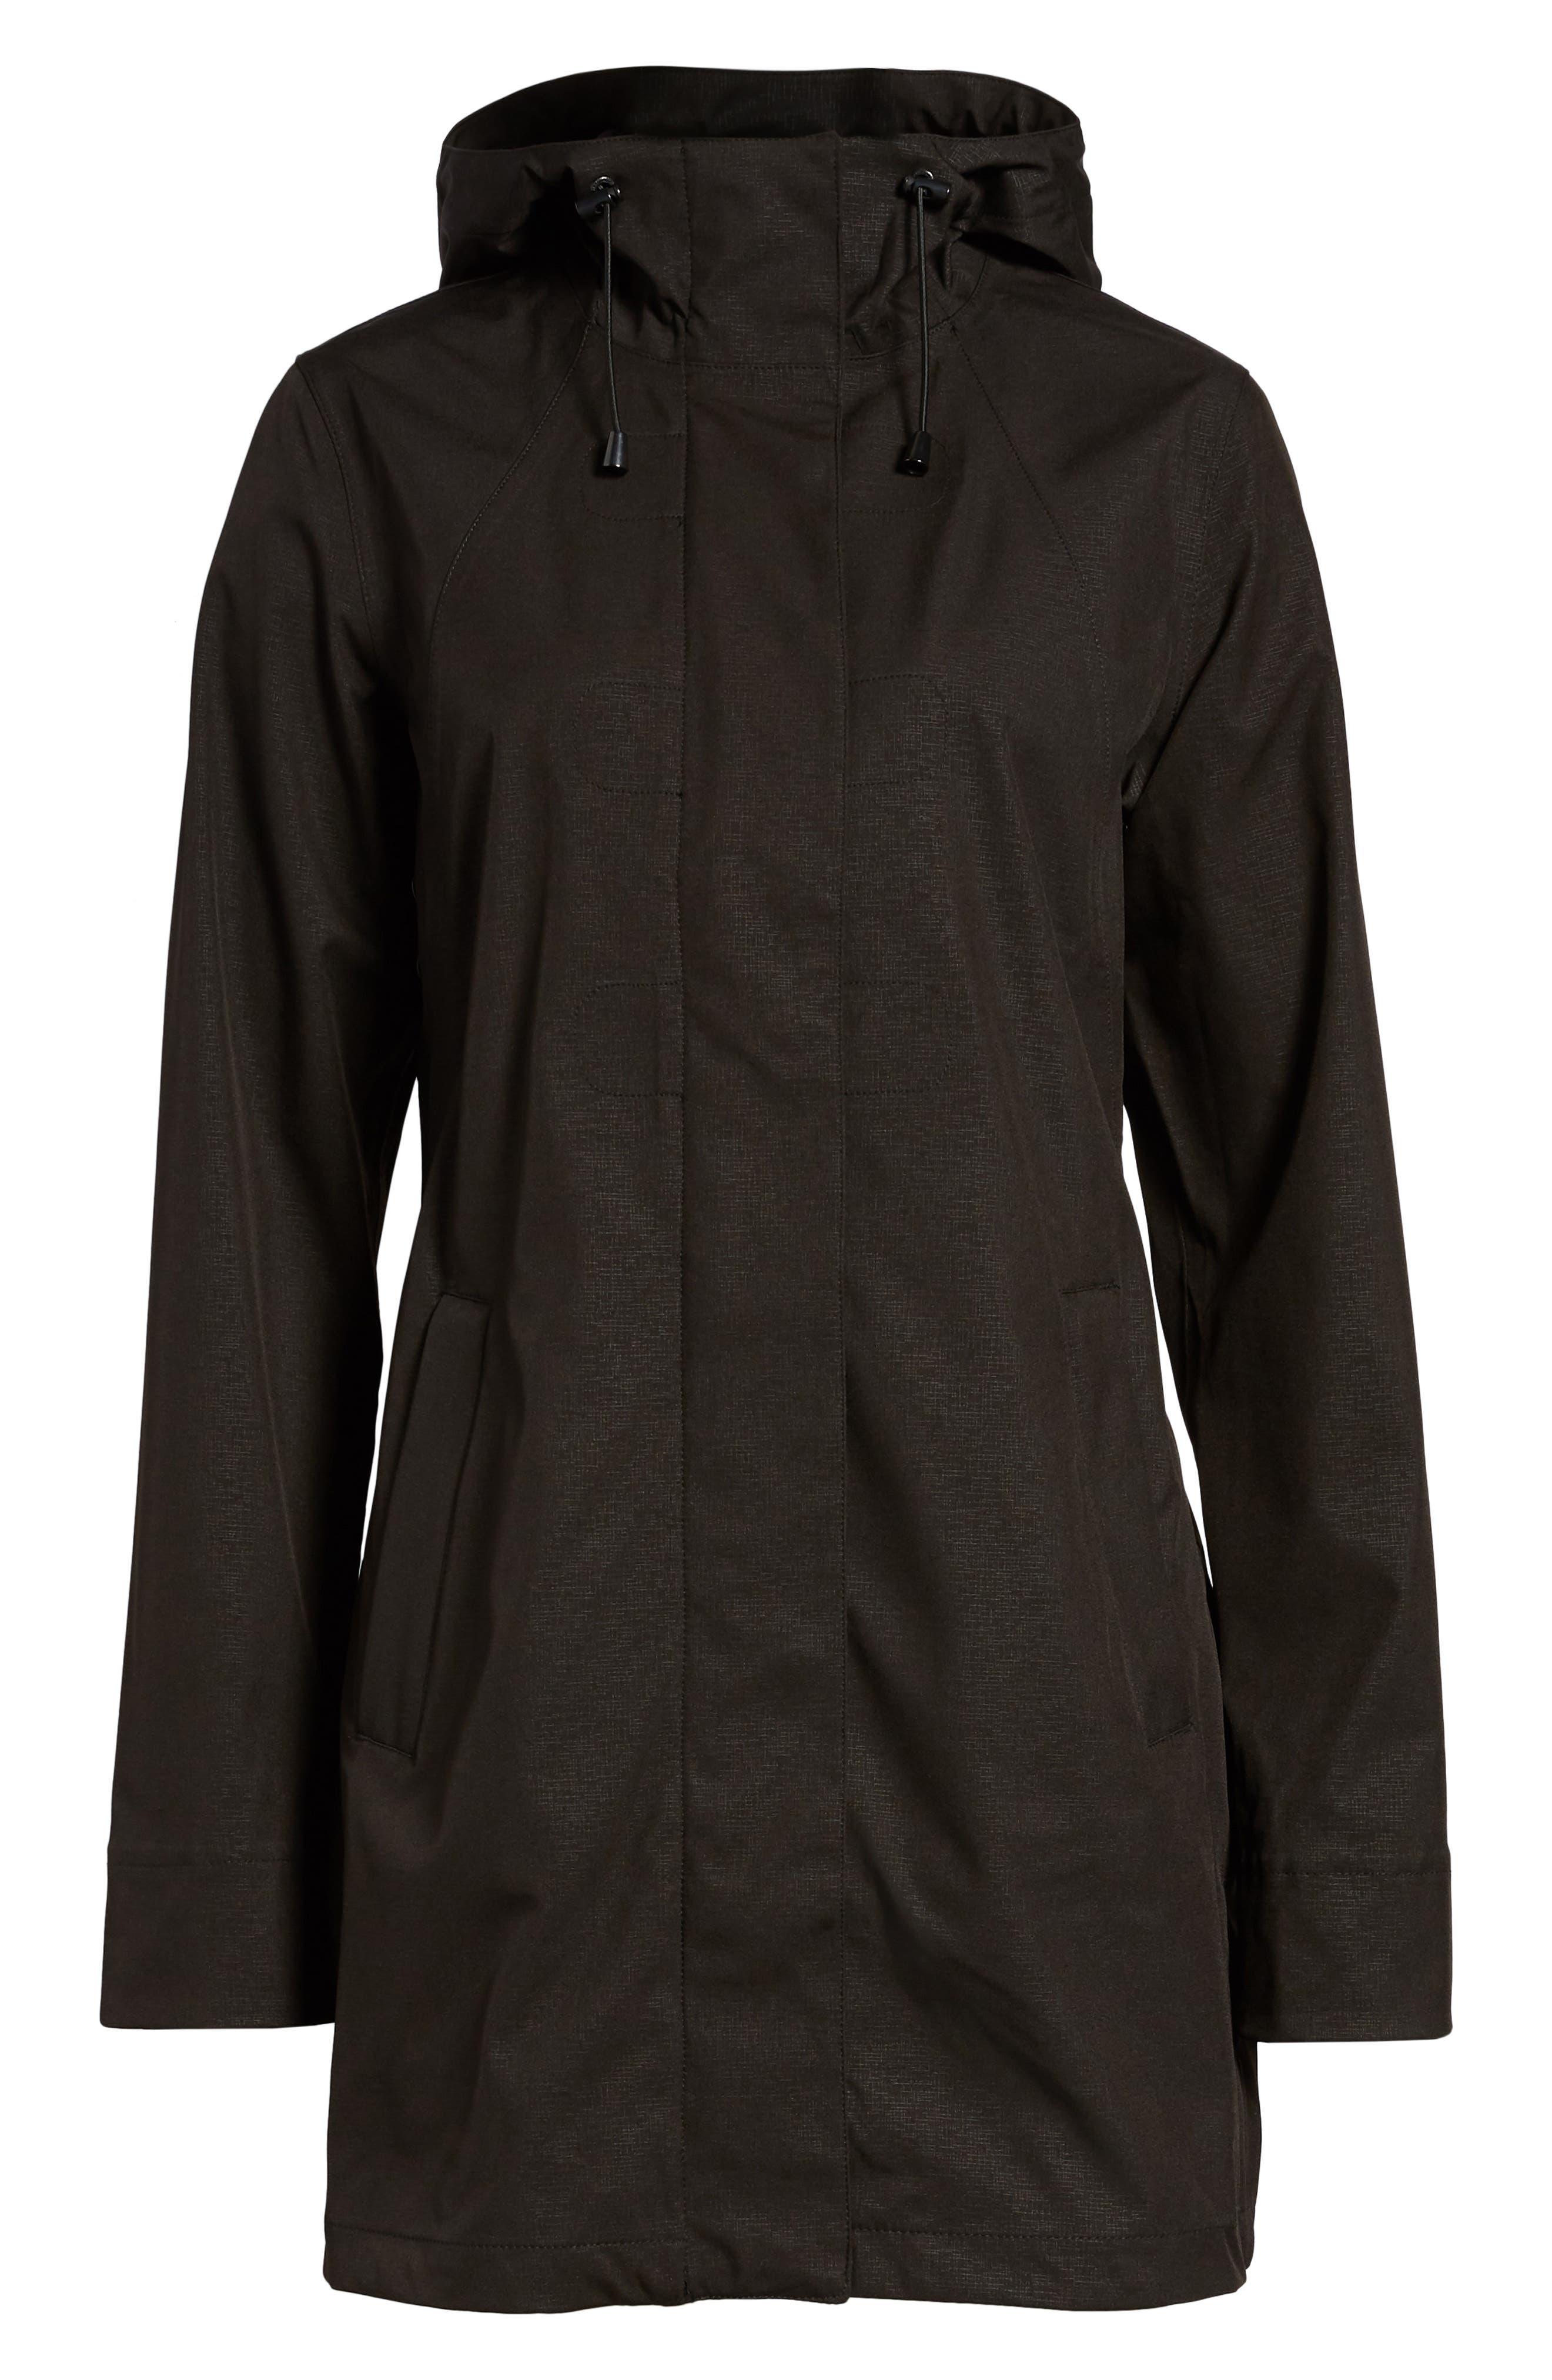 Soft Shell Raincoat,                         Main,                         color, Black